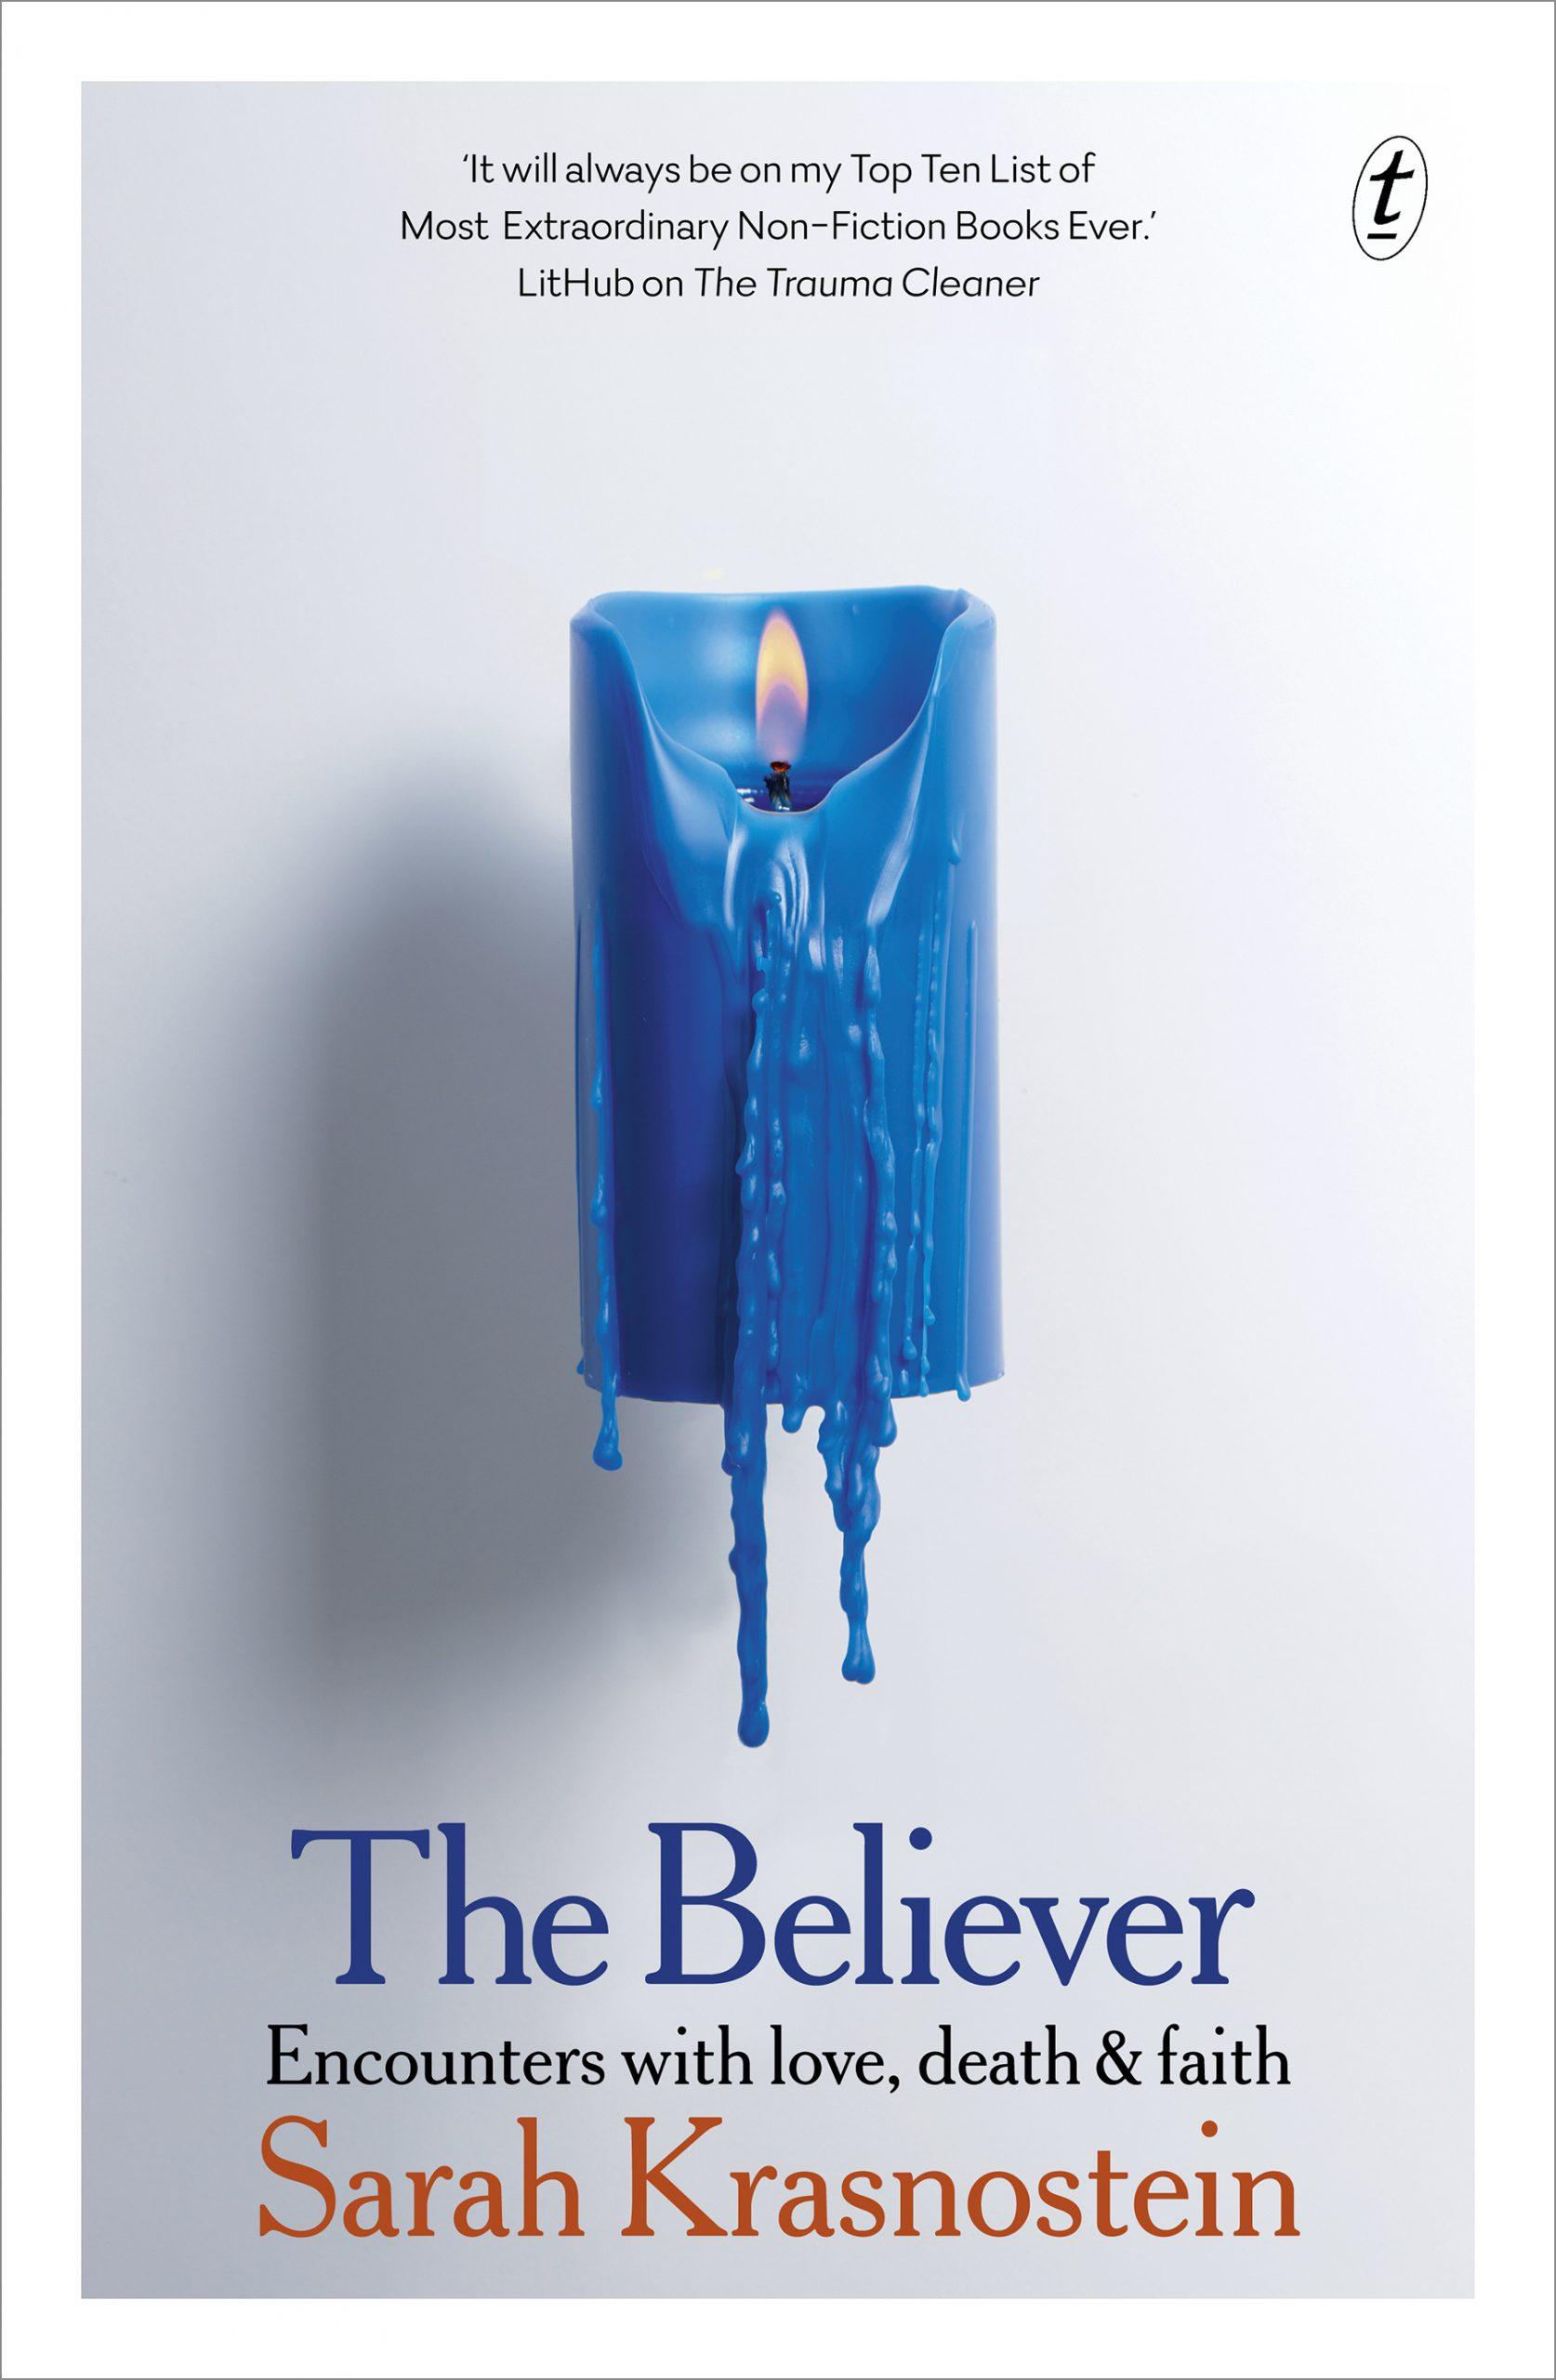 The Believer: Encounters with Love, Death & Faith